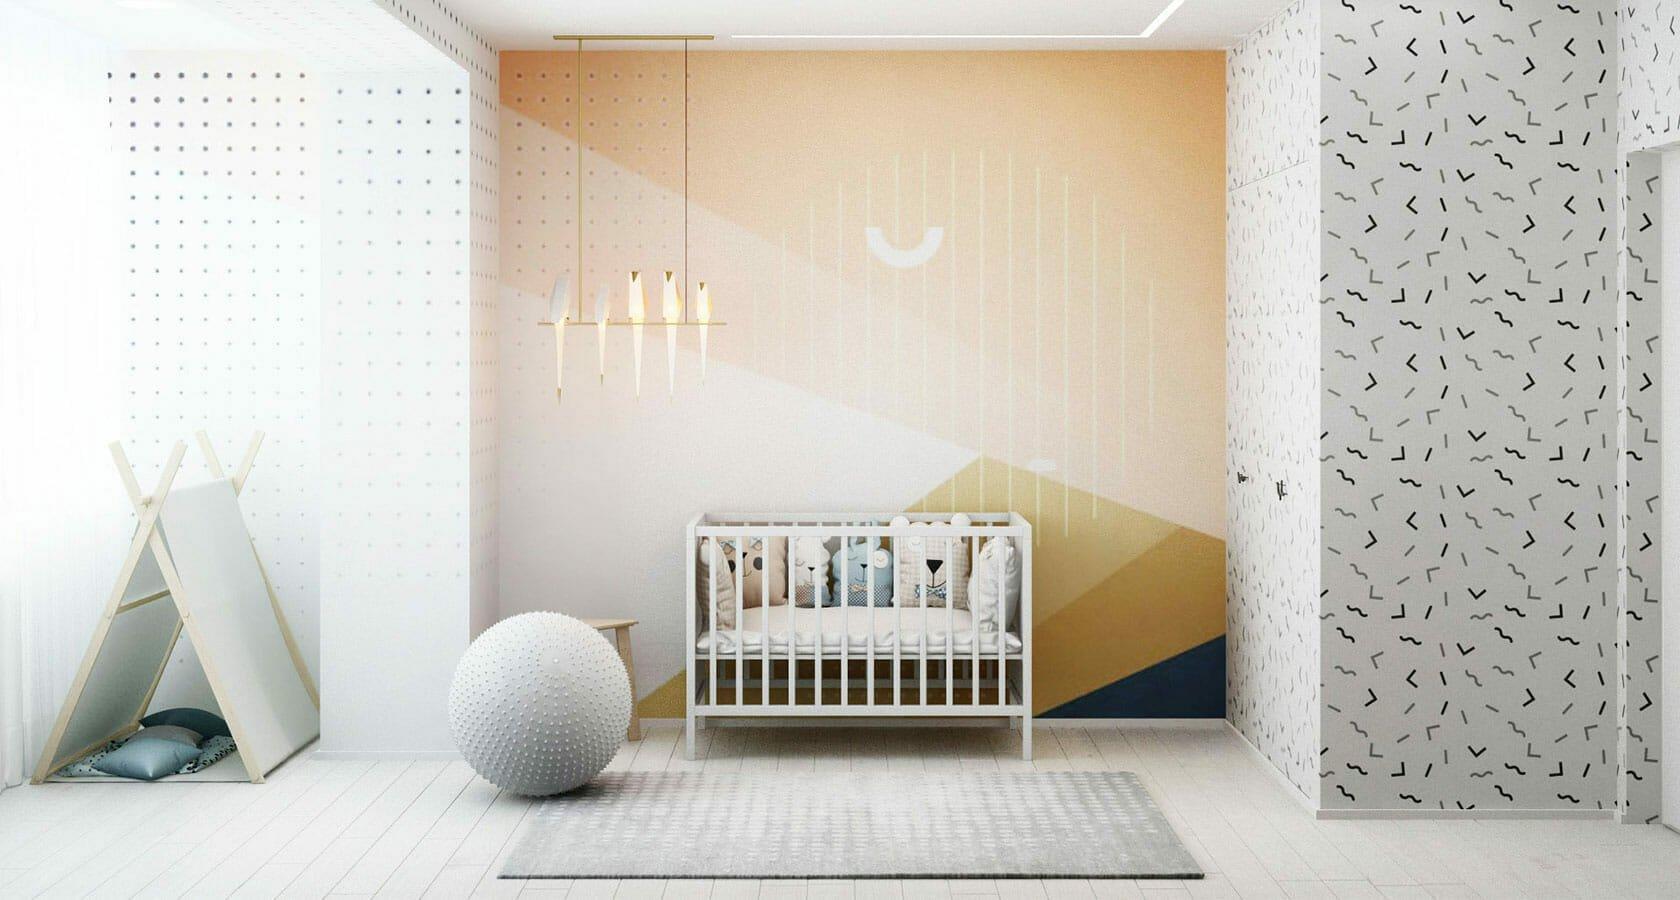 Scandinavian nursery decor by Margaryta S